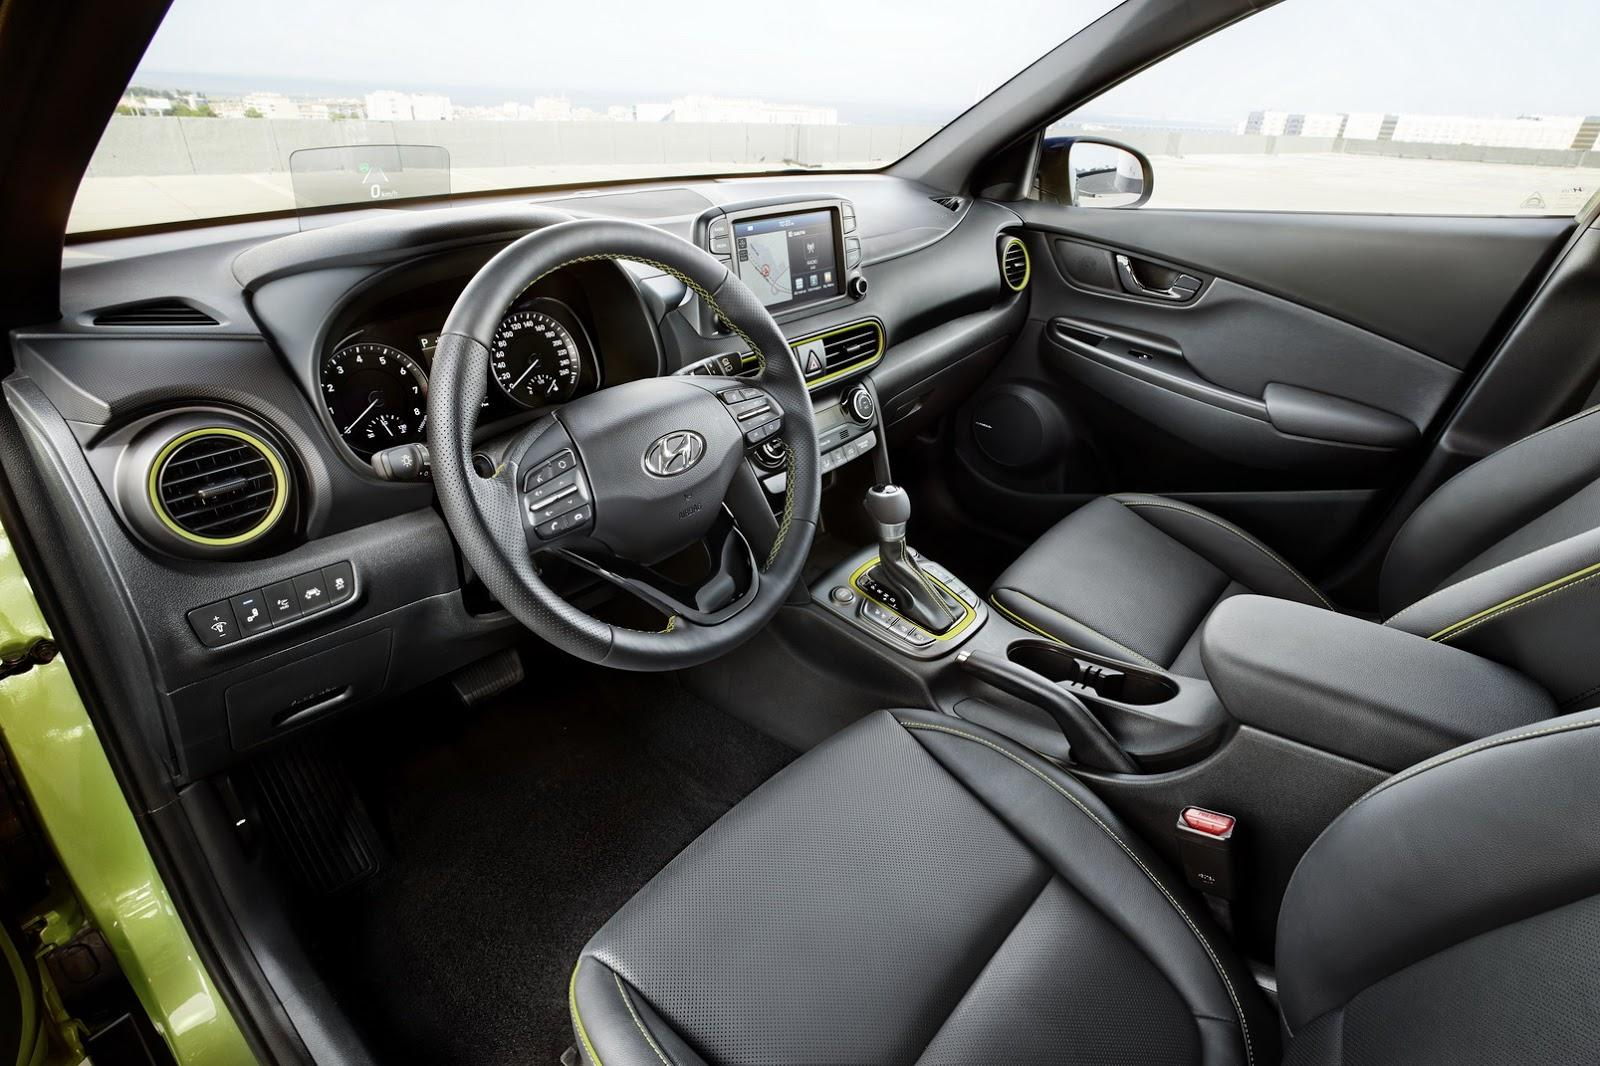 Interior Hyundai Kona - Interior Hyundai Kona